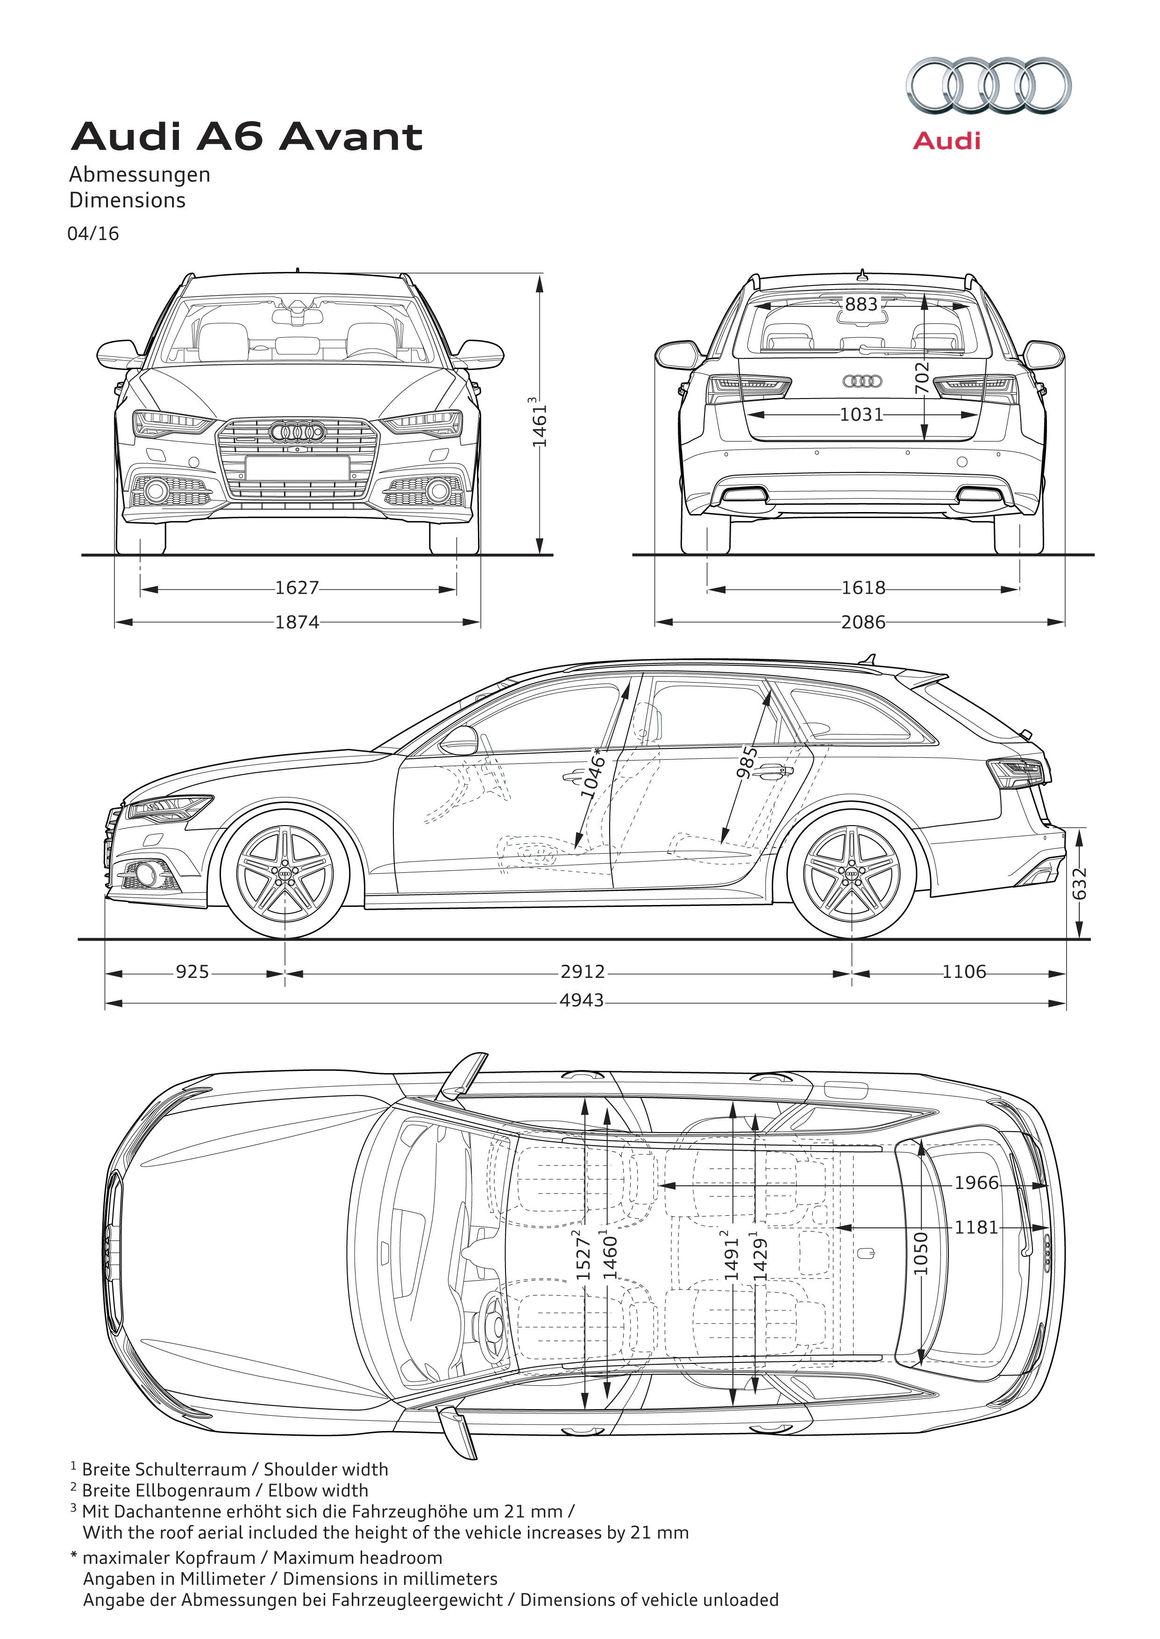 Audi Rs6 Avant Engine Diagram - Escalade Fuse Box Locations -  clubcar.tukune.jeanjaures37.fr | Audi Rs6 Avant Engine Diagram |  | Wiring Diagram Resource